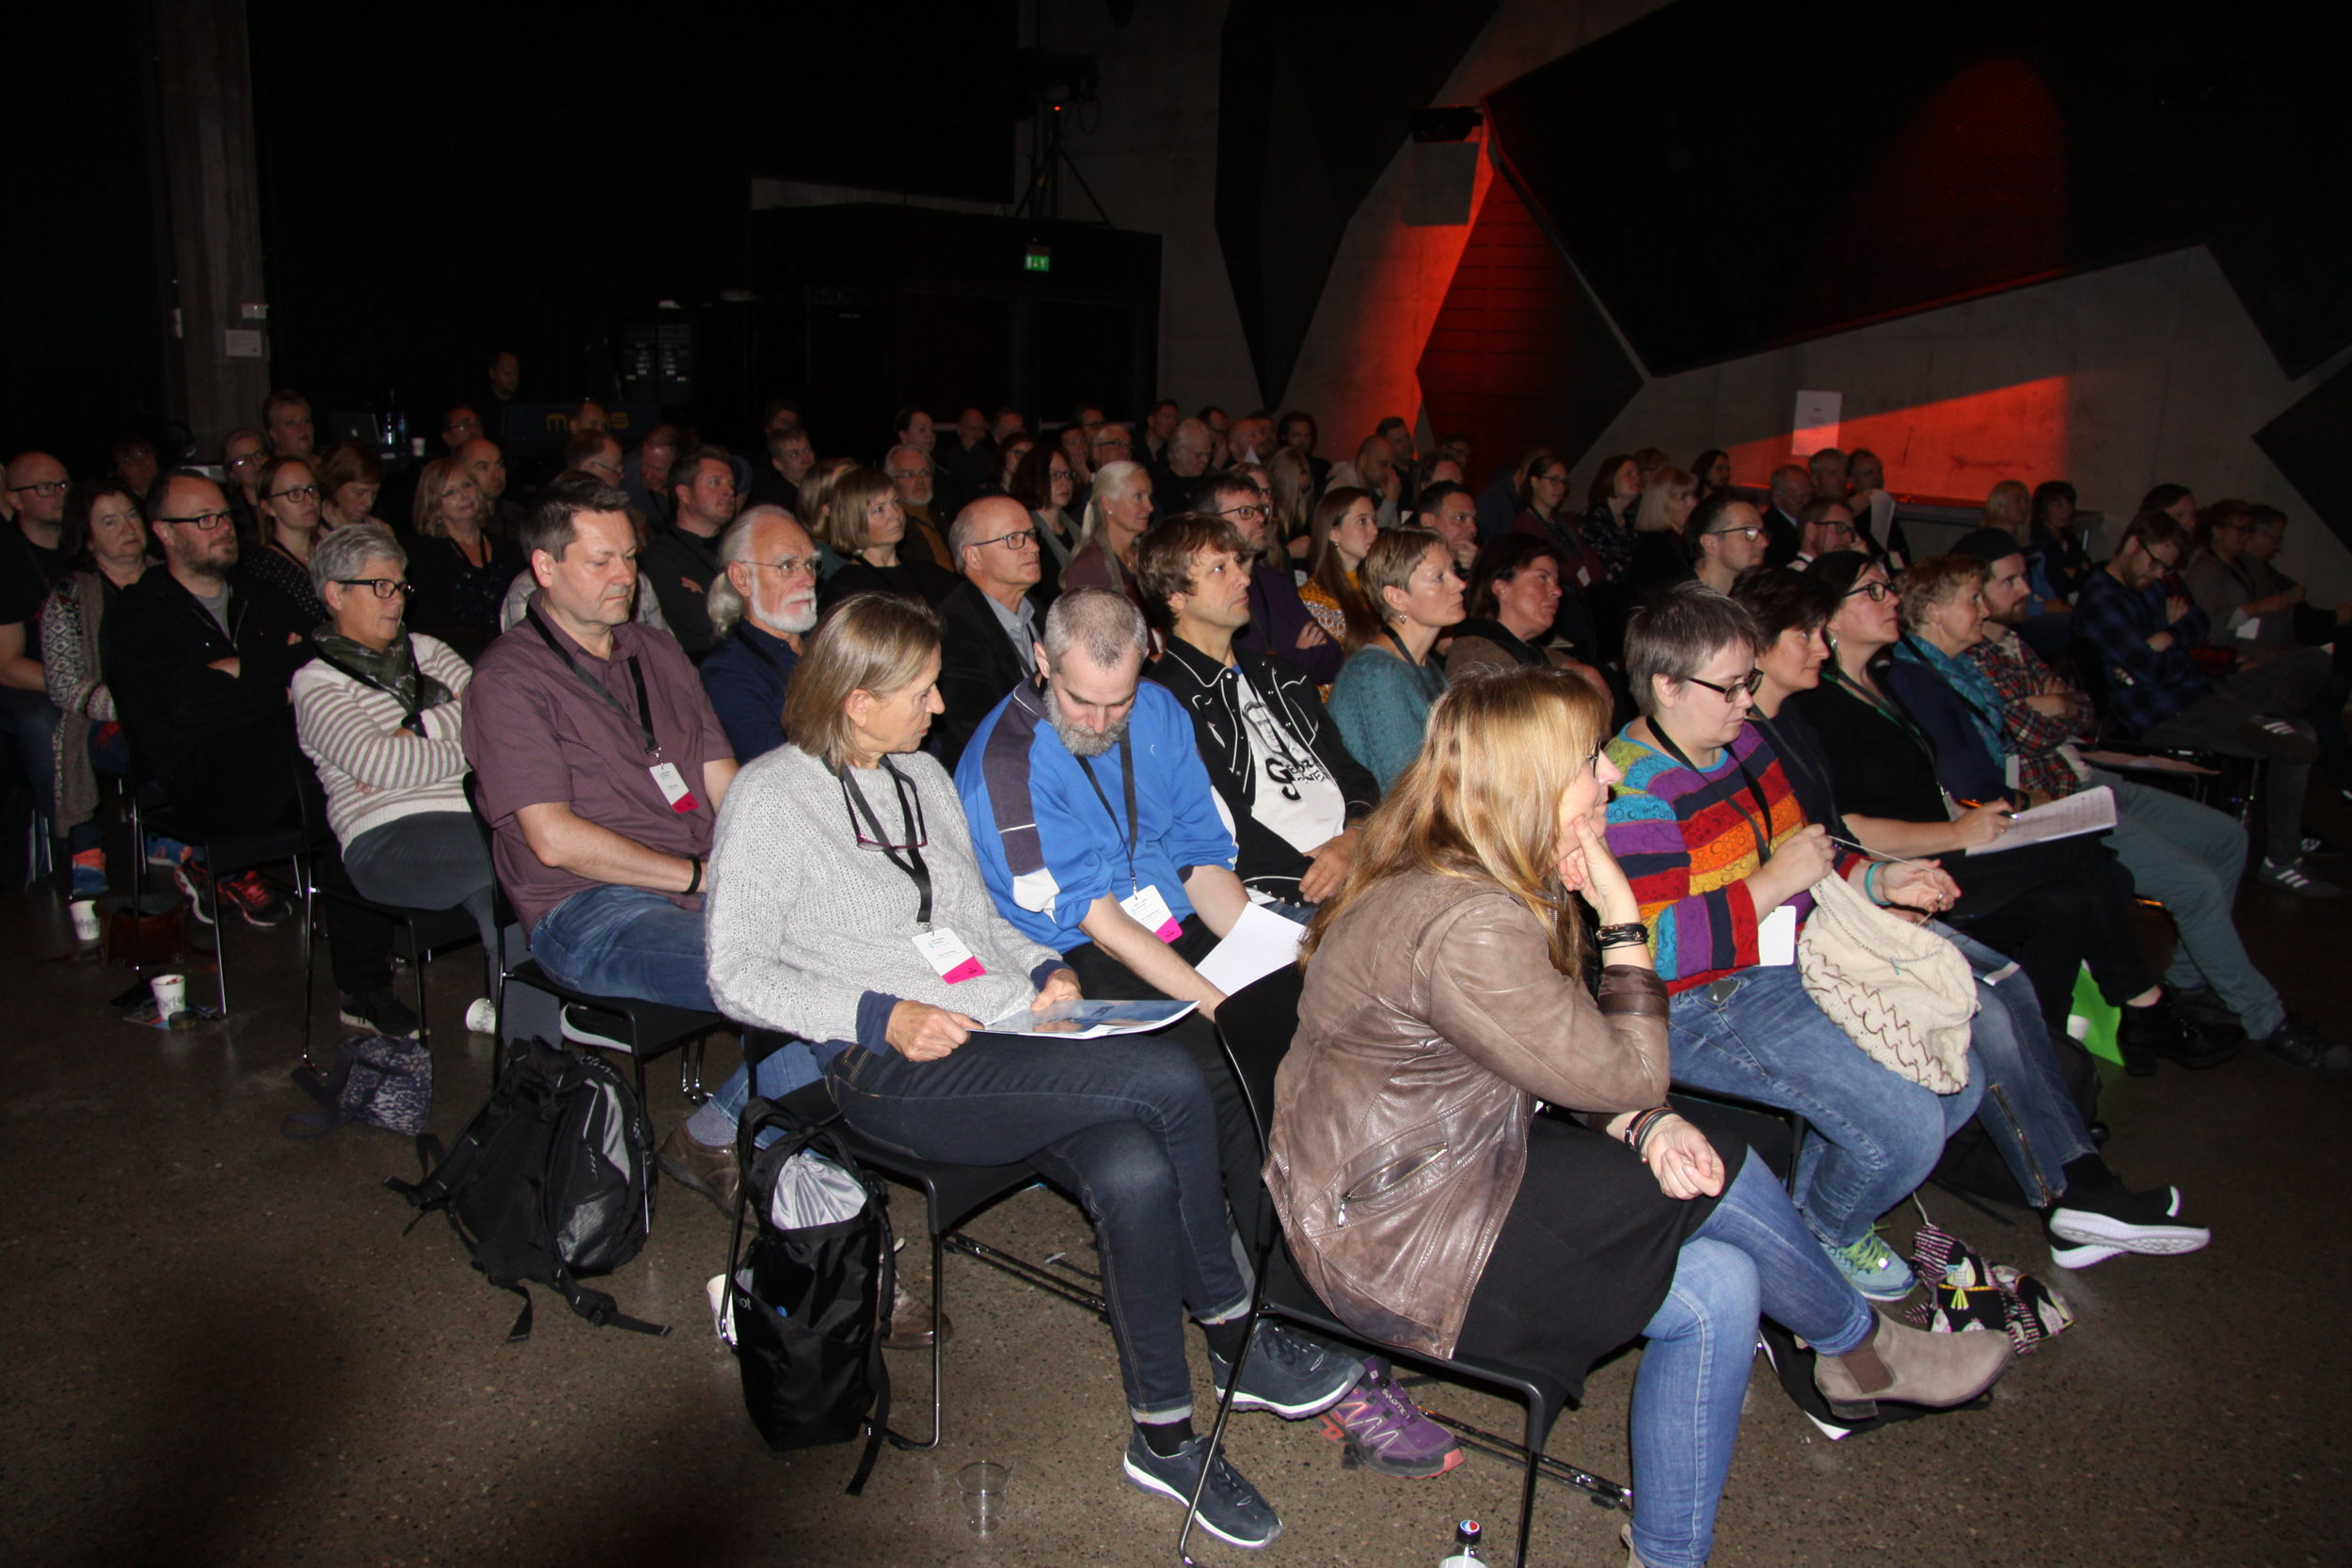 Stor interesse for lydarkivkonferansen på Rockheim i oktober med 100 deltakere.